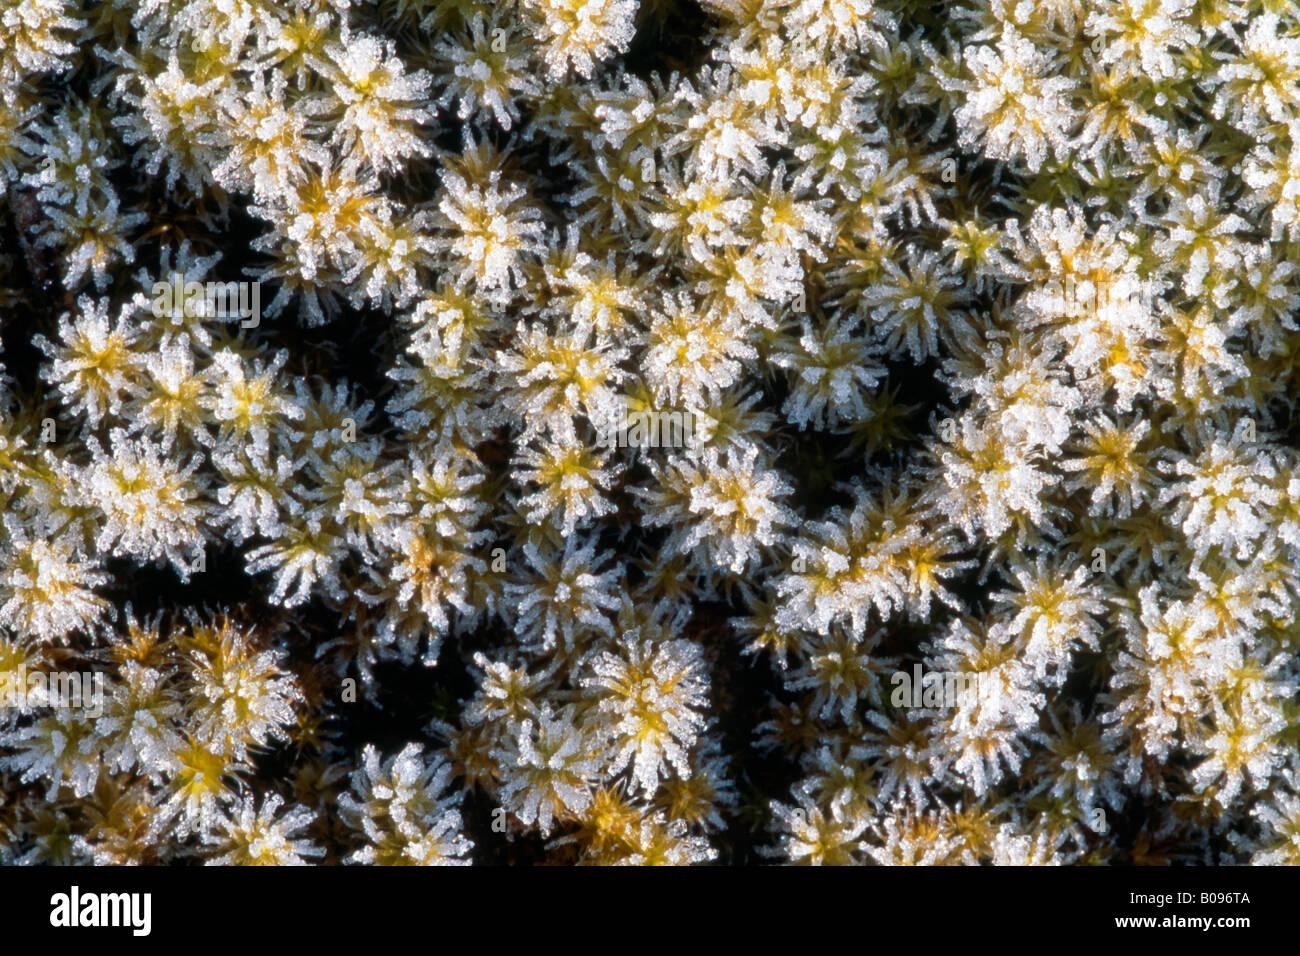 Springy Turf-moss or Bent-leaf Moss (Rhytidiadelphus squarrosus), Tirol, Austria - Stock Image